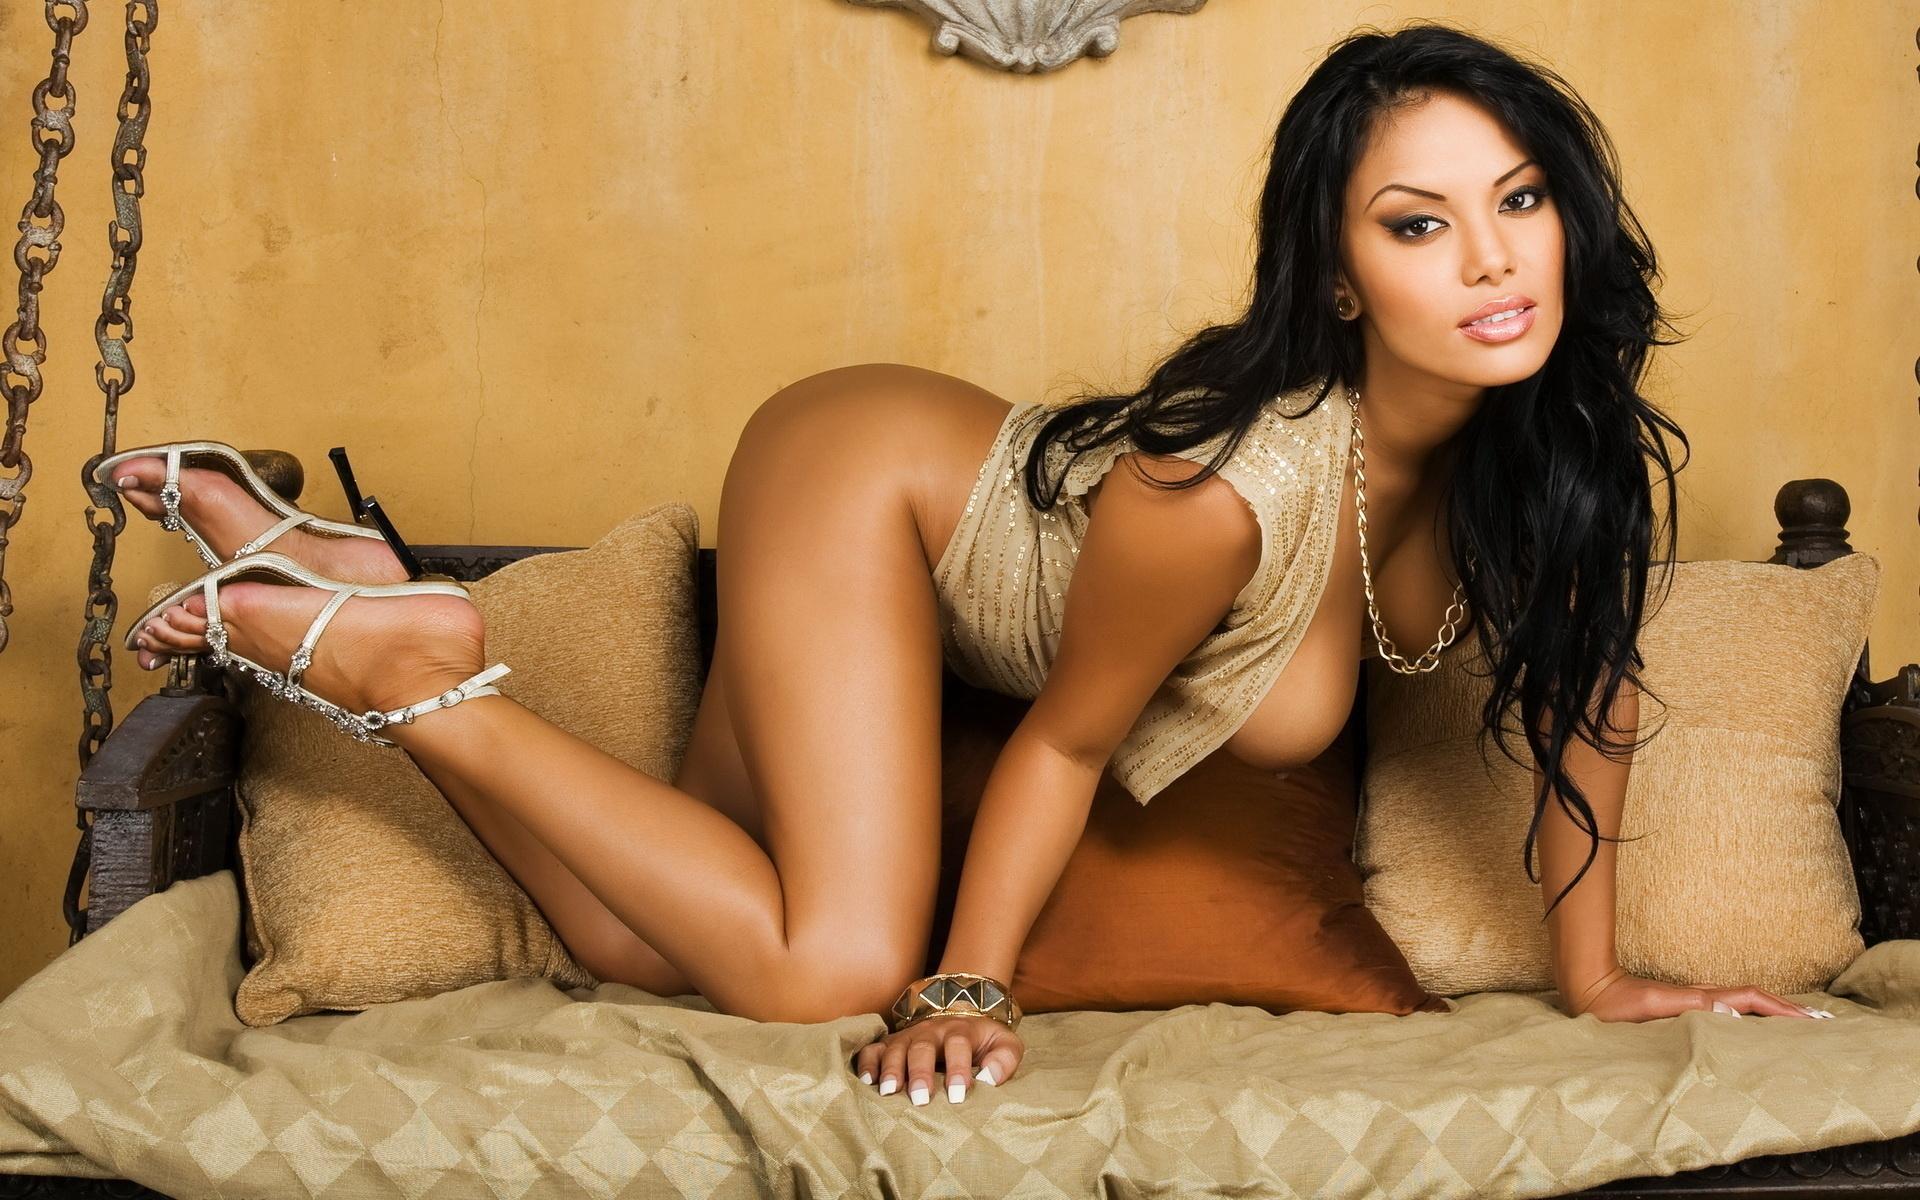 hispanic-angels-sexy-girls-die-icarly-nude